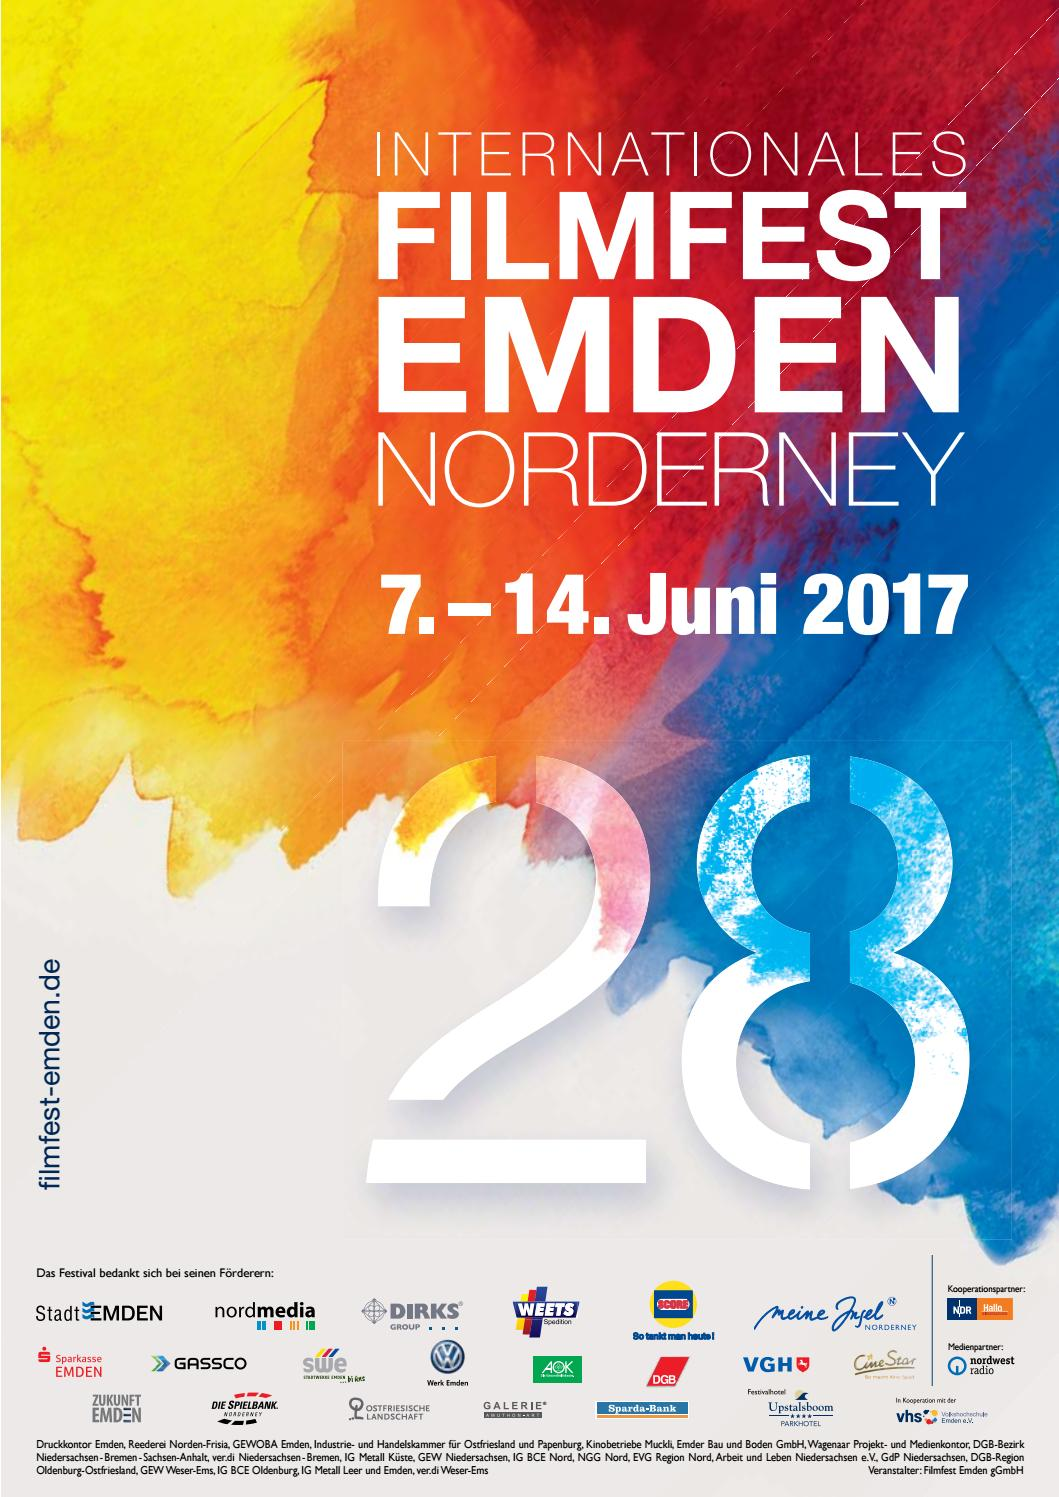 Katalog 2017 Filmfest Emden-Norderney by Internationales Filmfest  Emden-Norderney - issuu